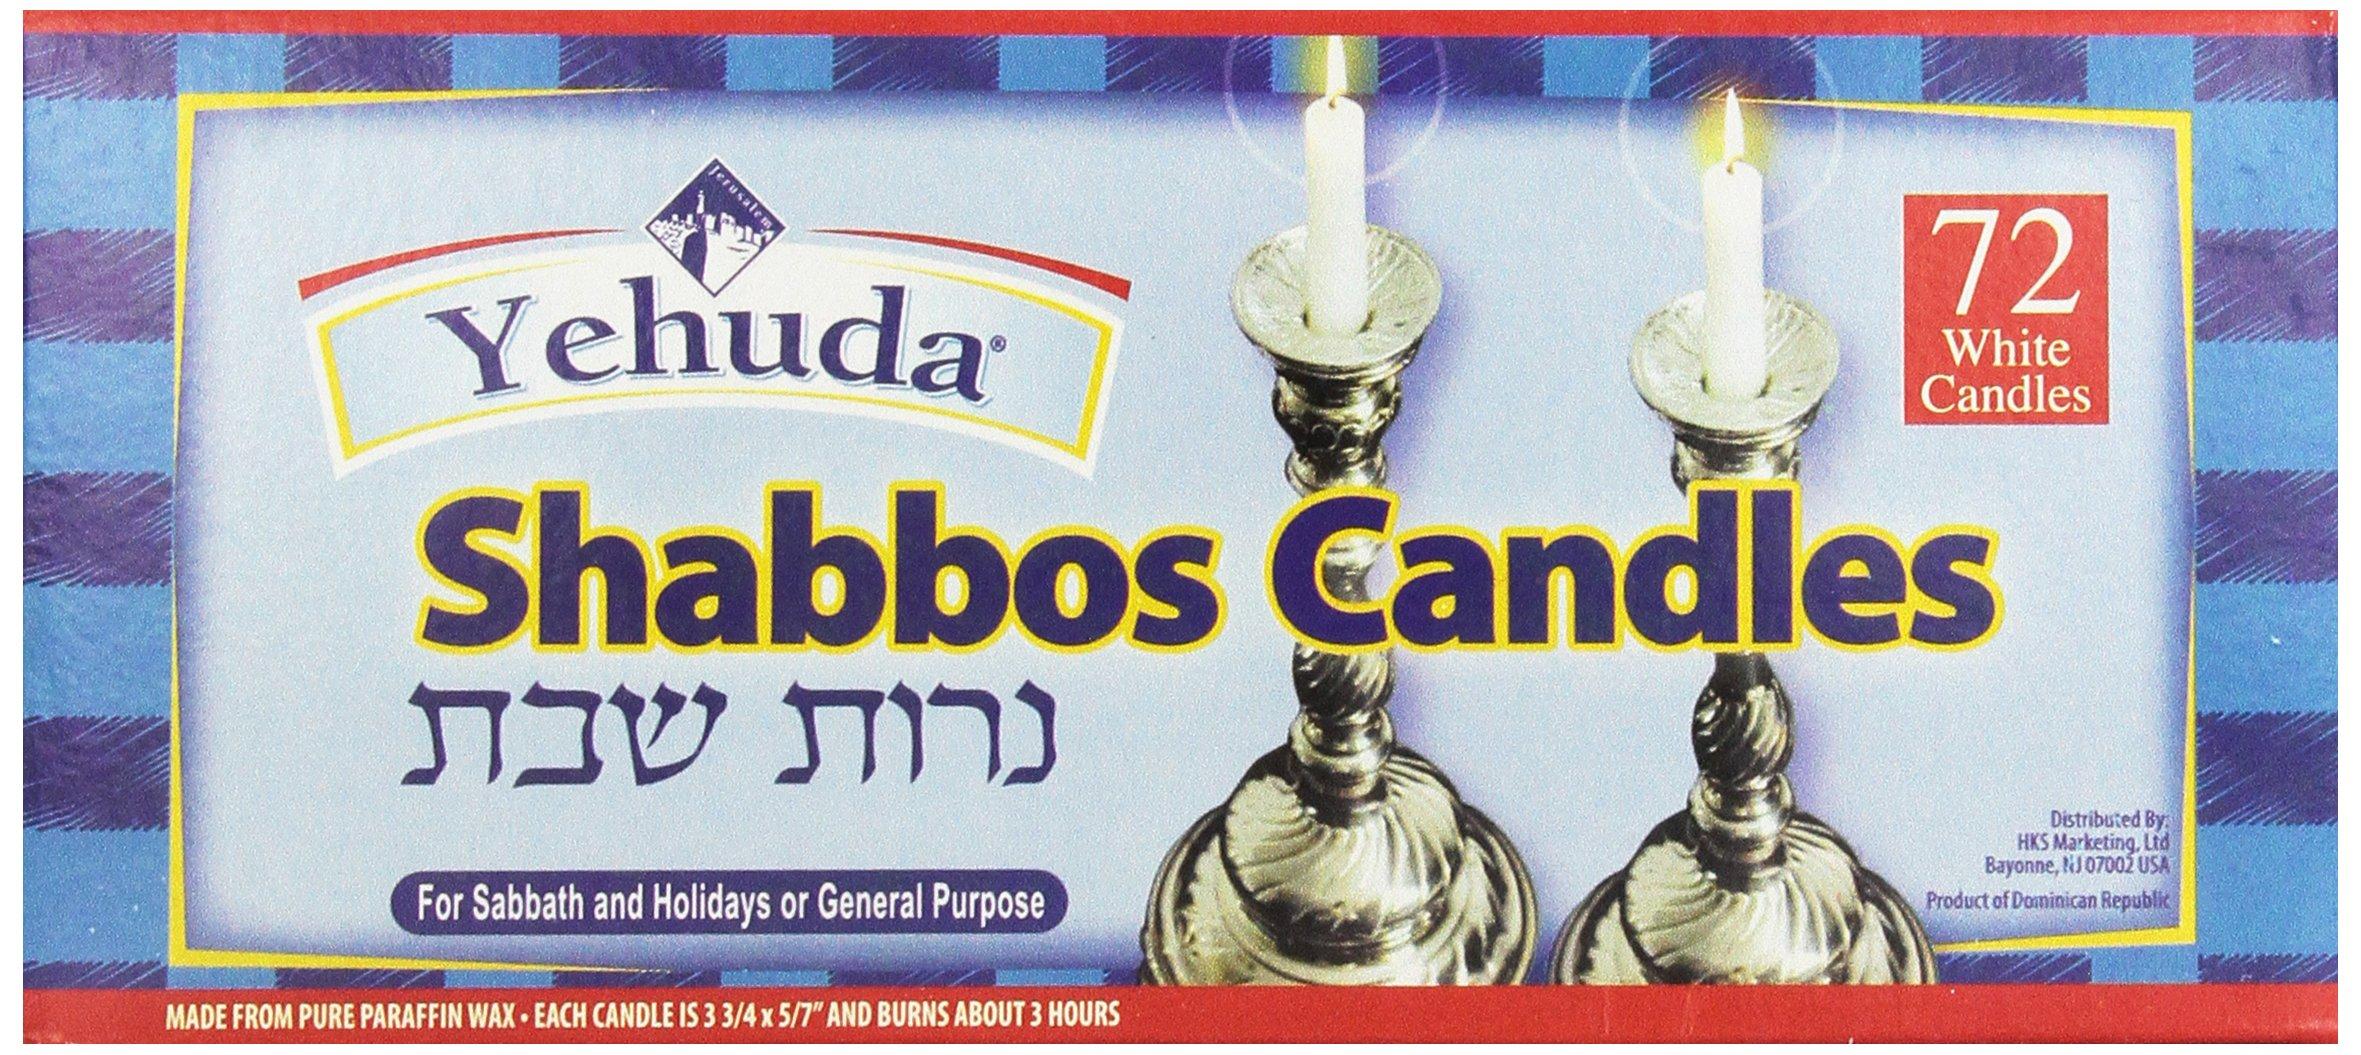 Yehuda 3 Hour White Sabbath Candles, 72 ct by Yehuda